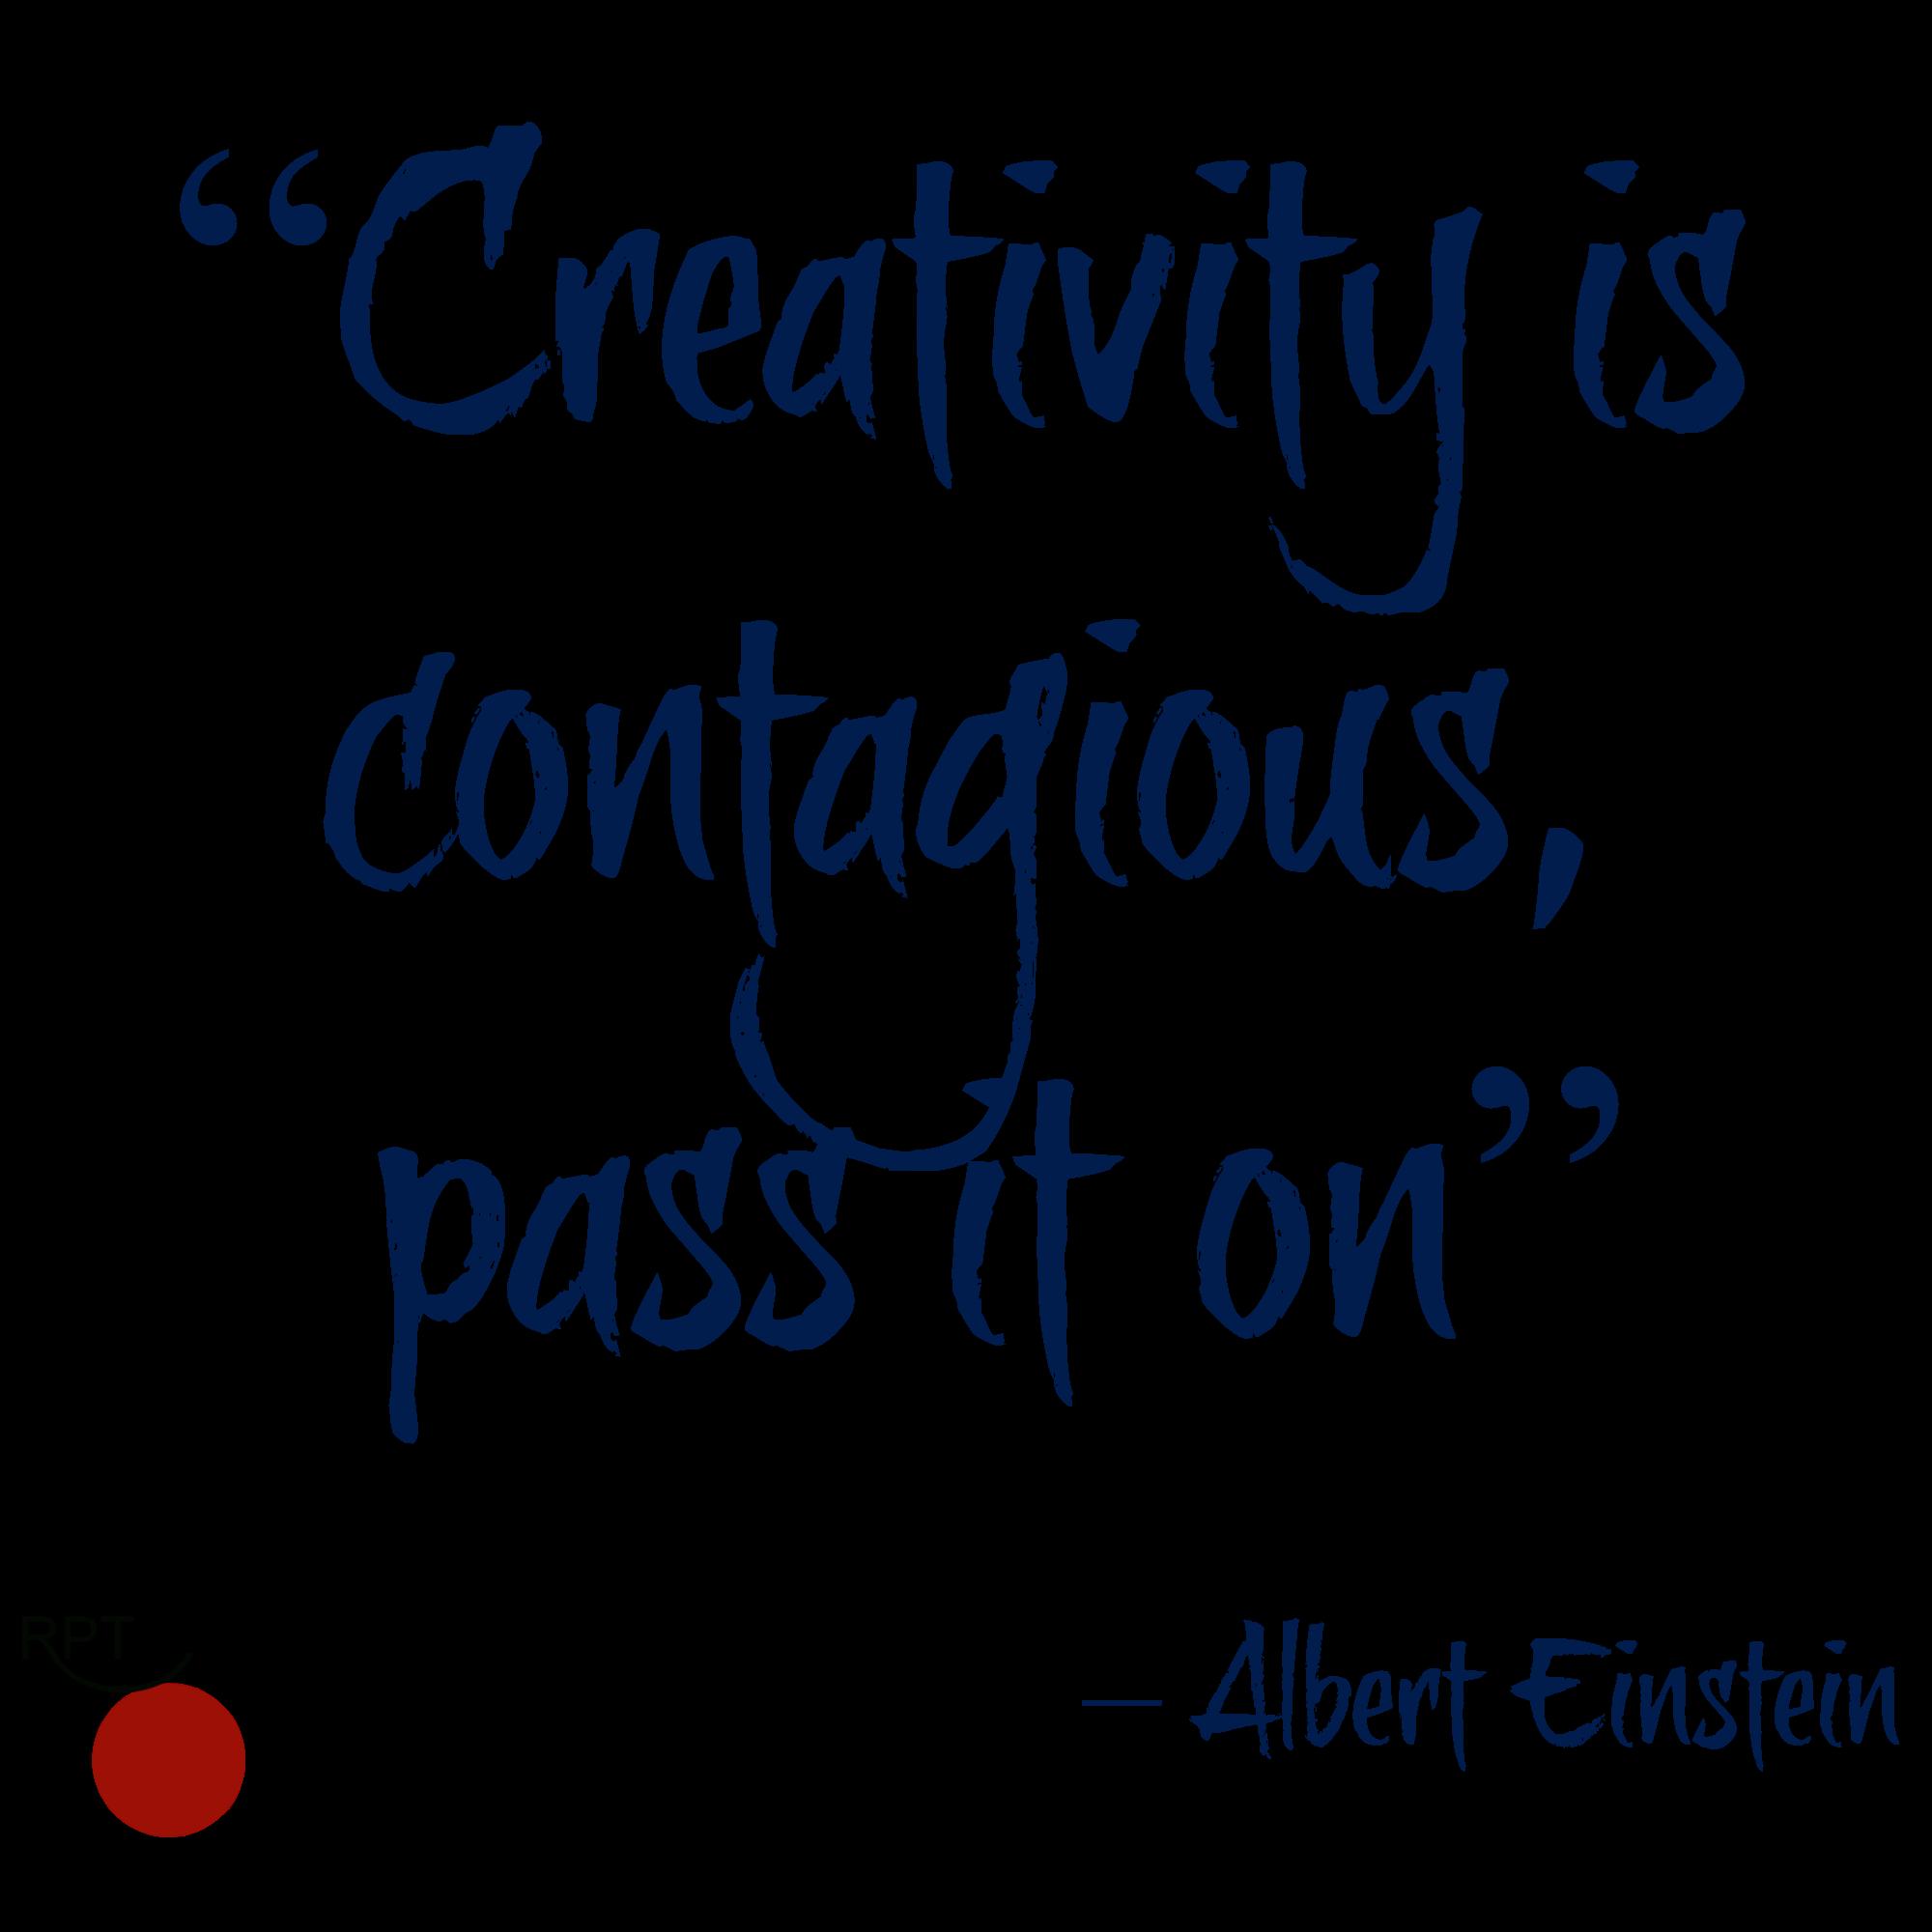 """Creativity is contagious,pass it on""– Albert Einstein"